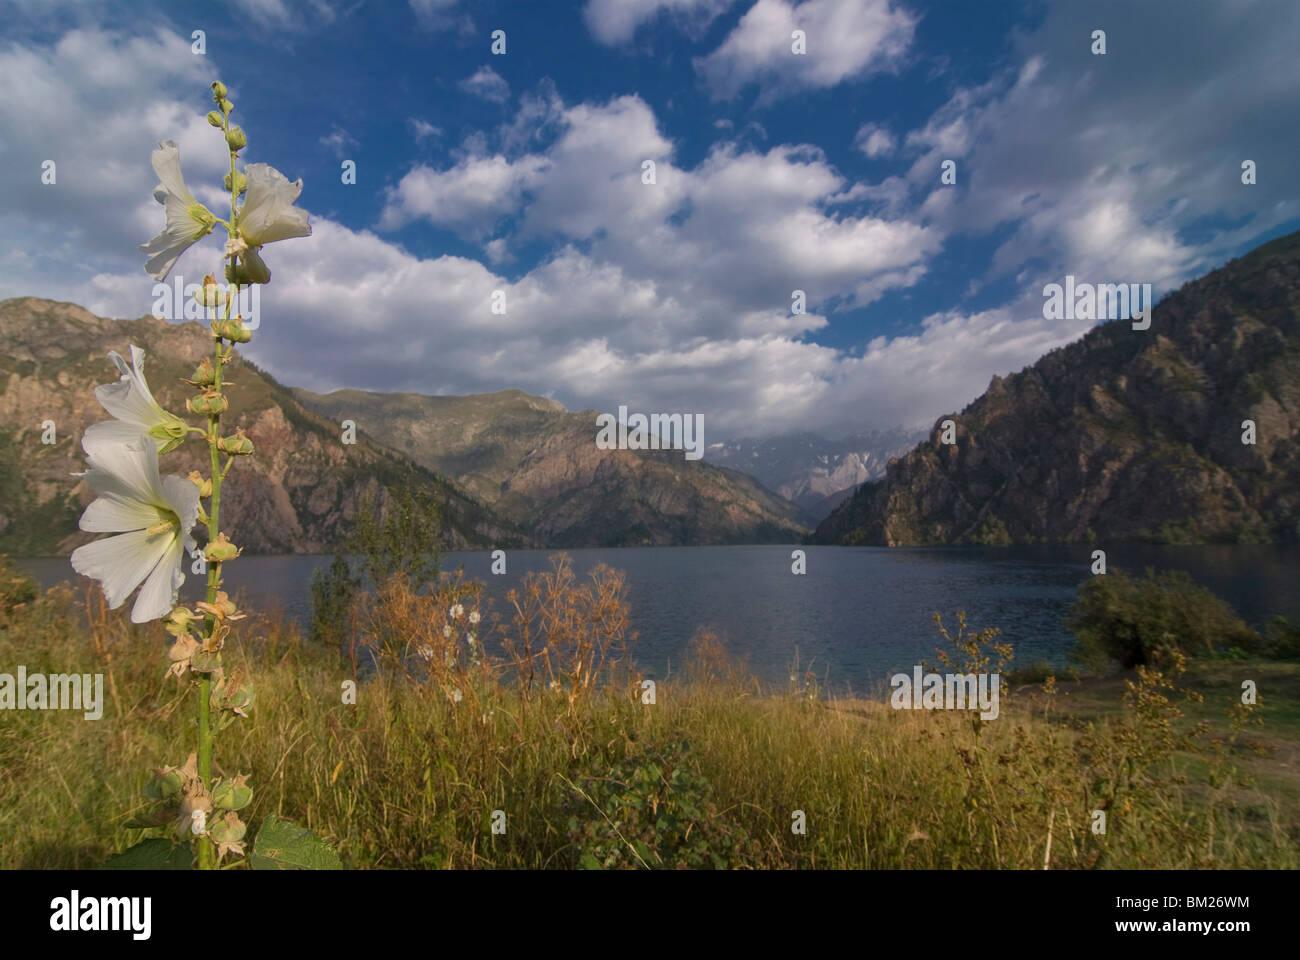 Sary-Chelek UNESCO Biosphäre Reservoir, Kirgisien, Zentralasien Stockbild